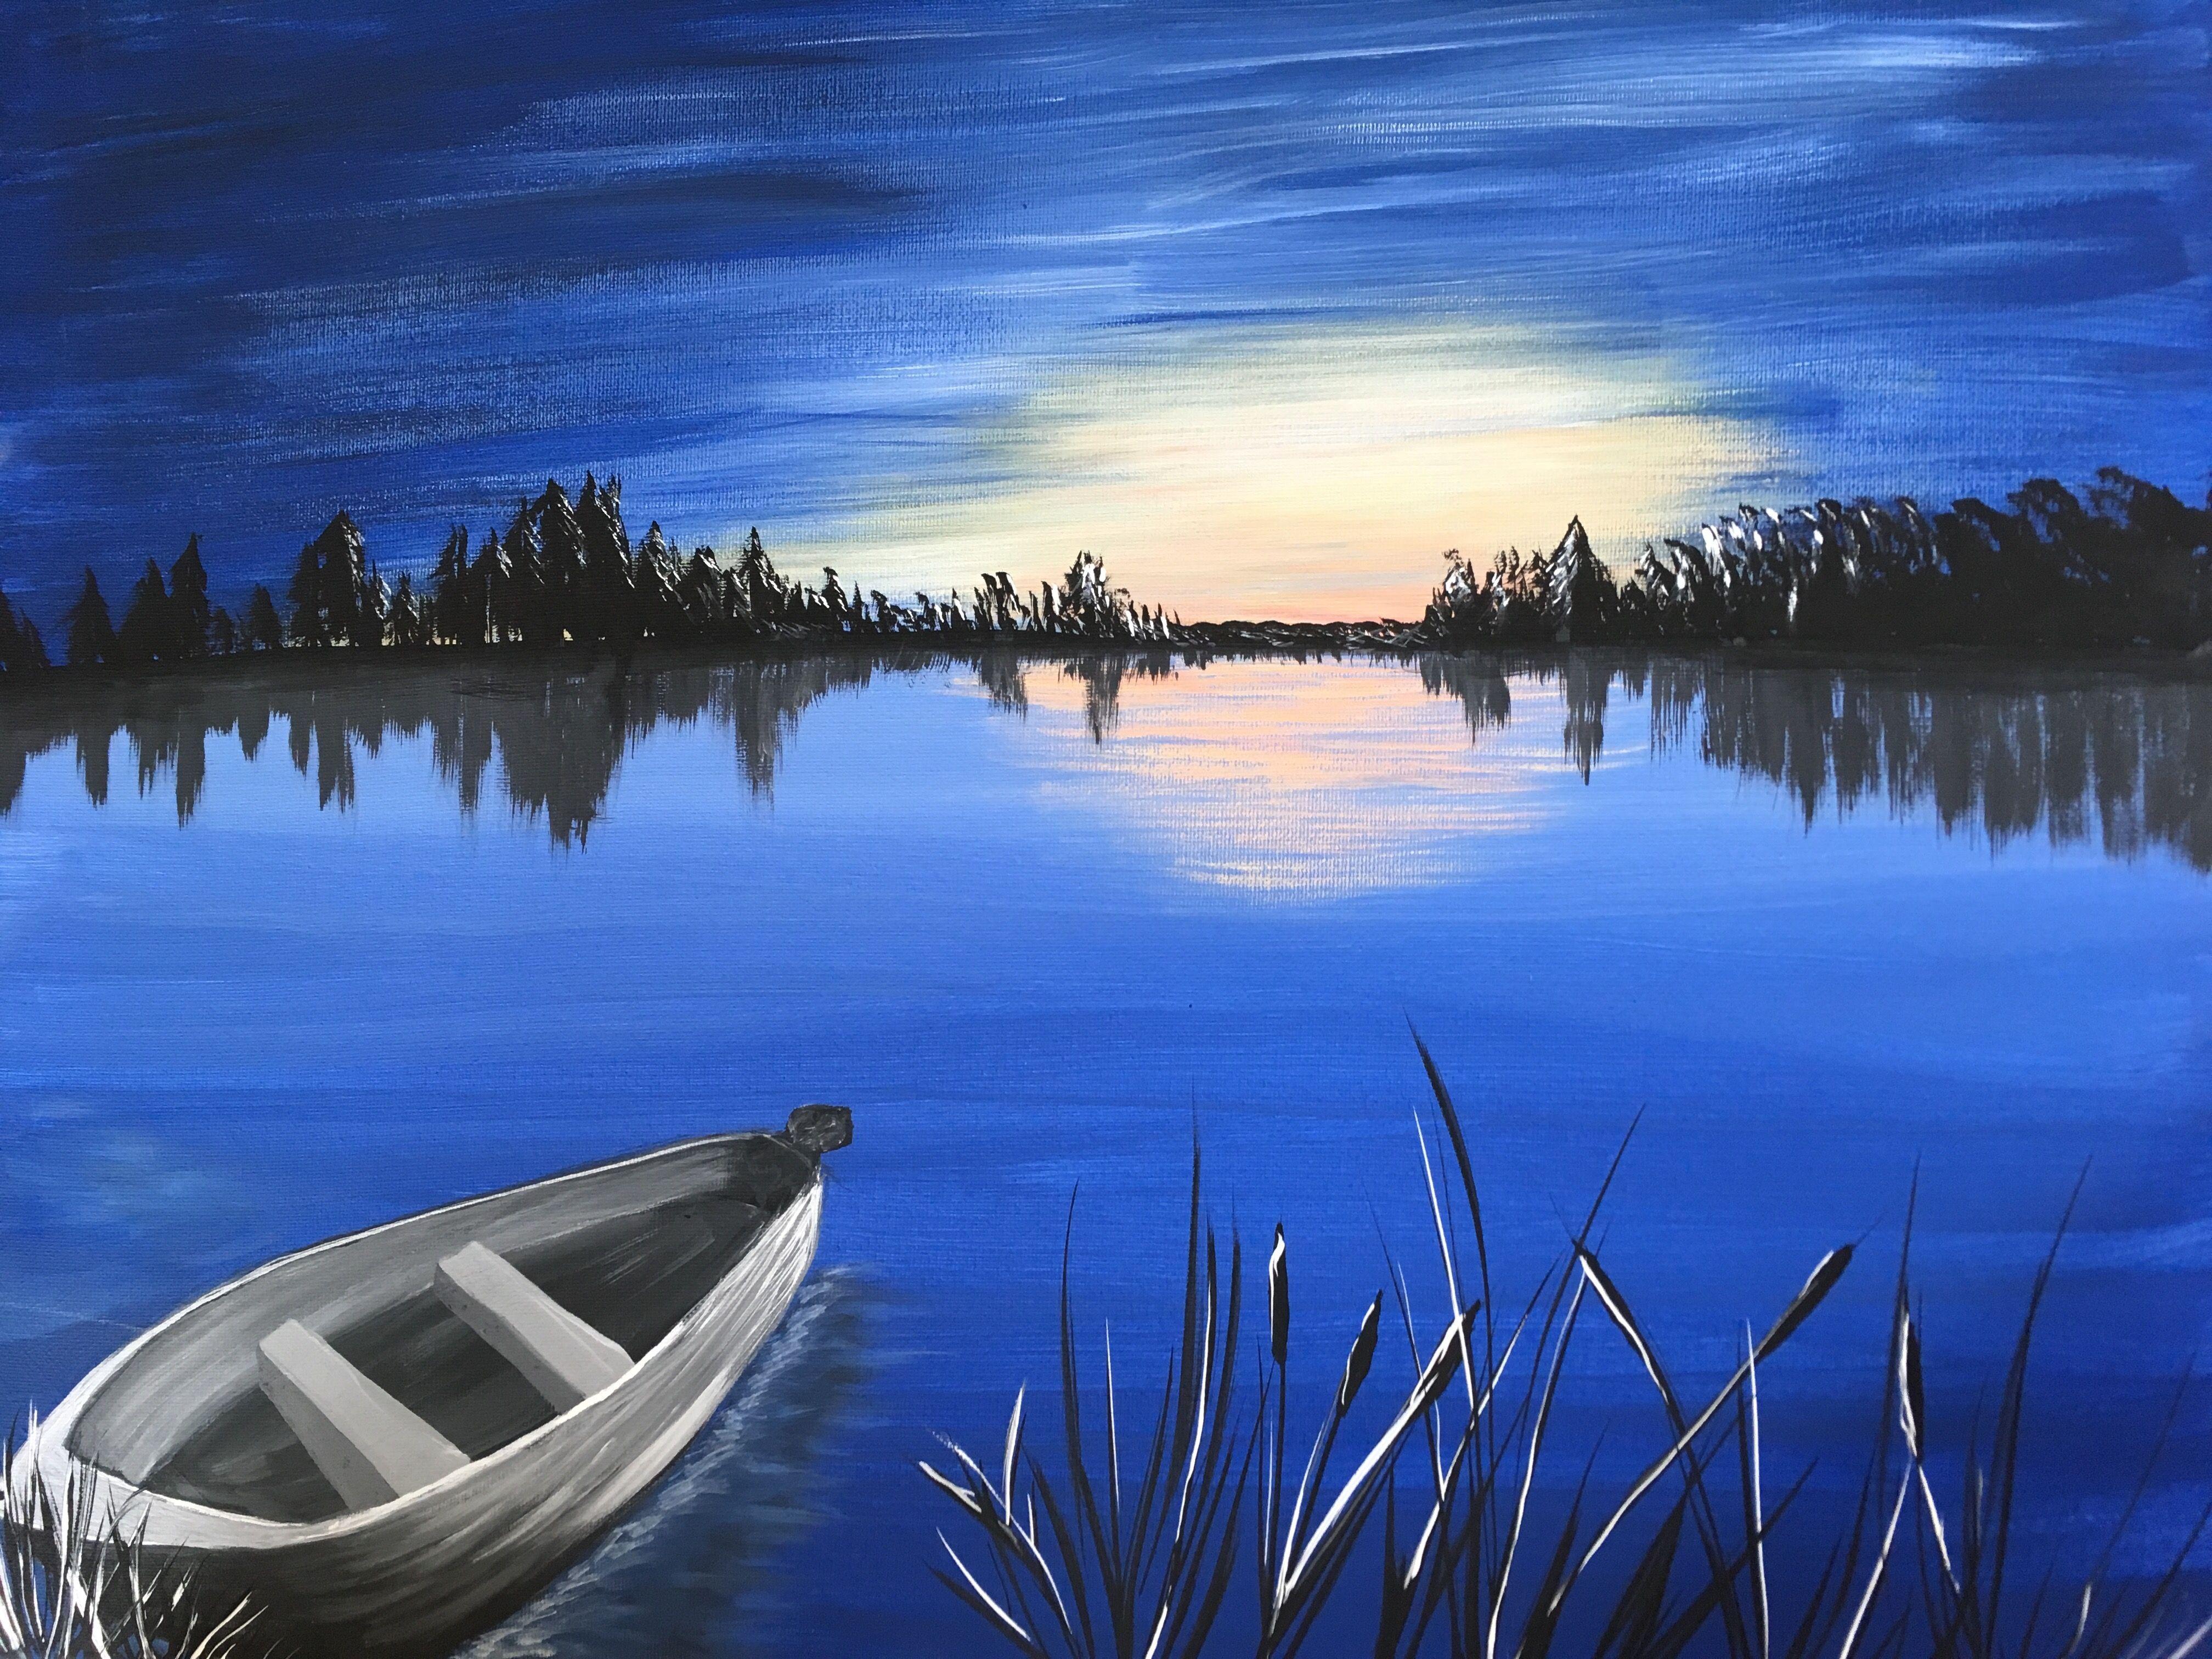 Five island lake at sunset Halifax Nova Scotia Island